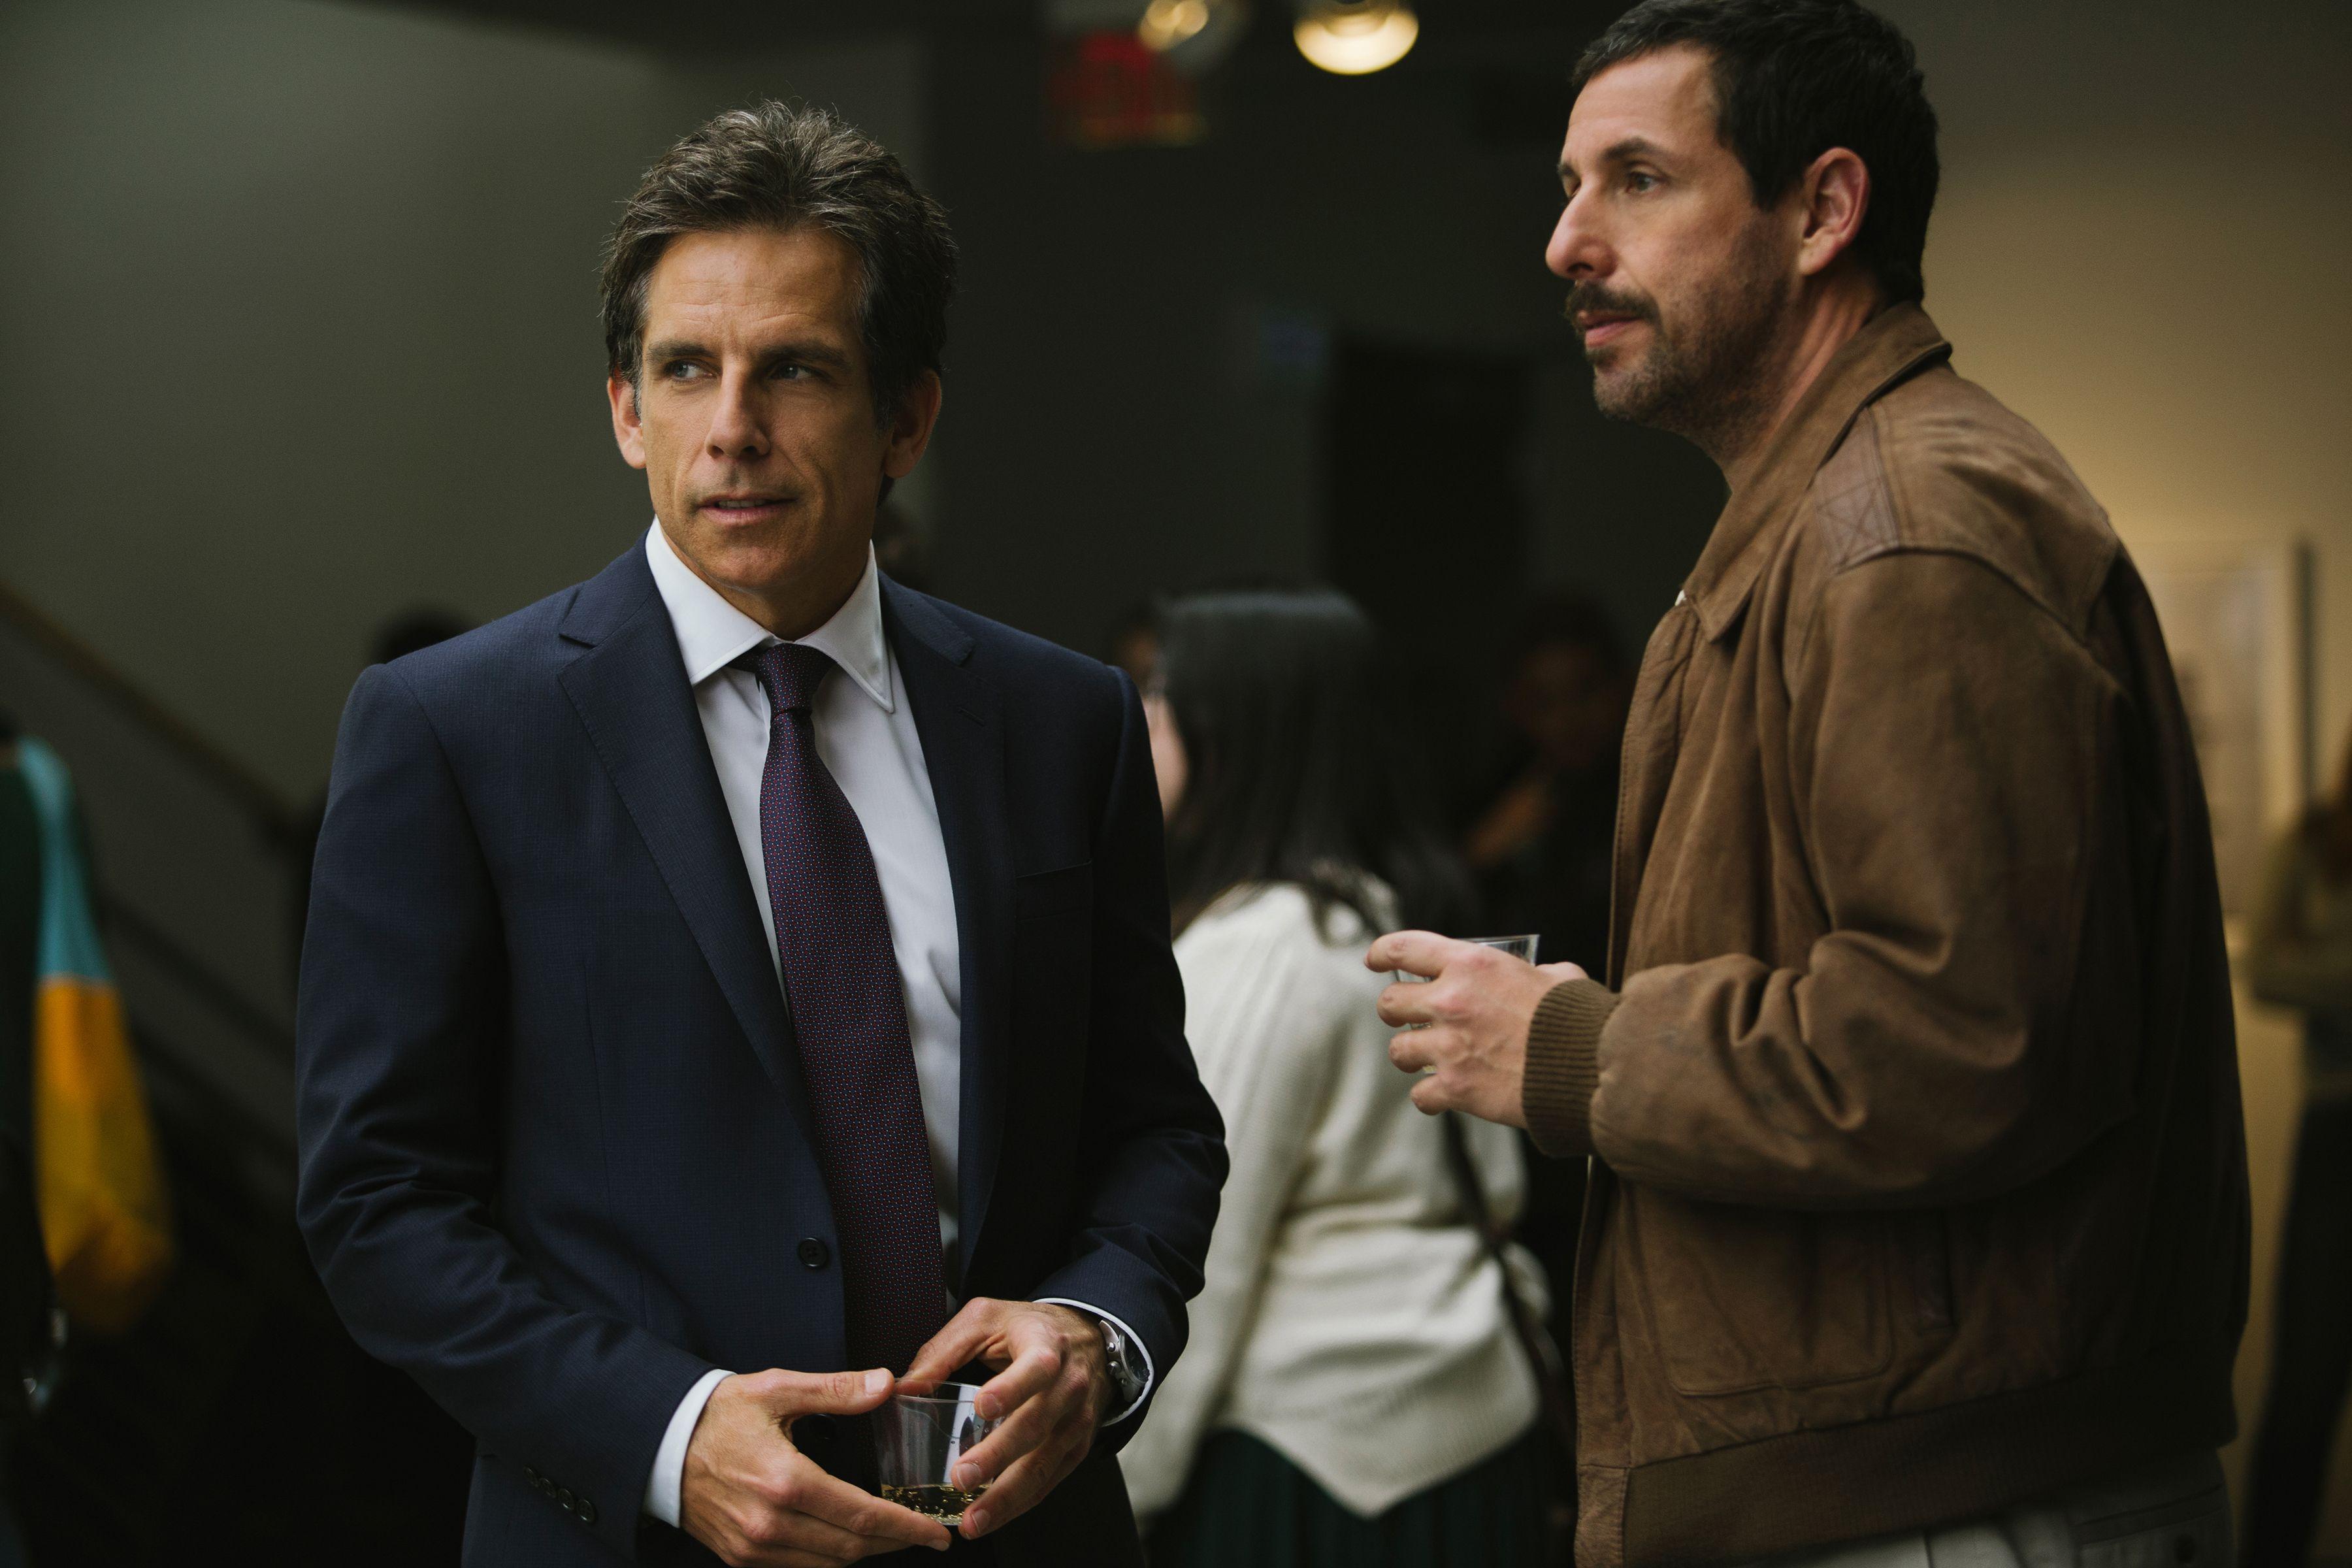 Ben Stiller, Adam Sandler, The Meyerowitz Stories